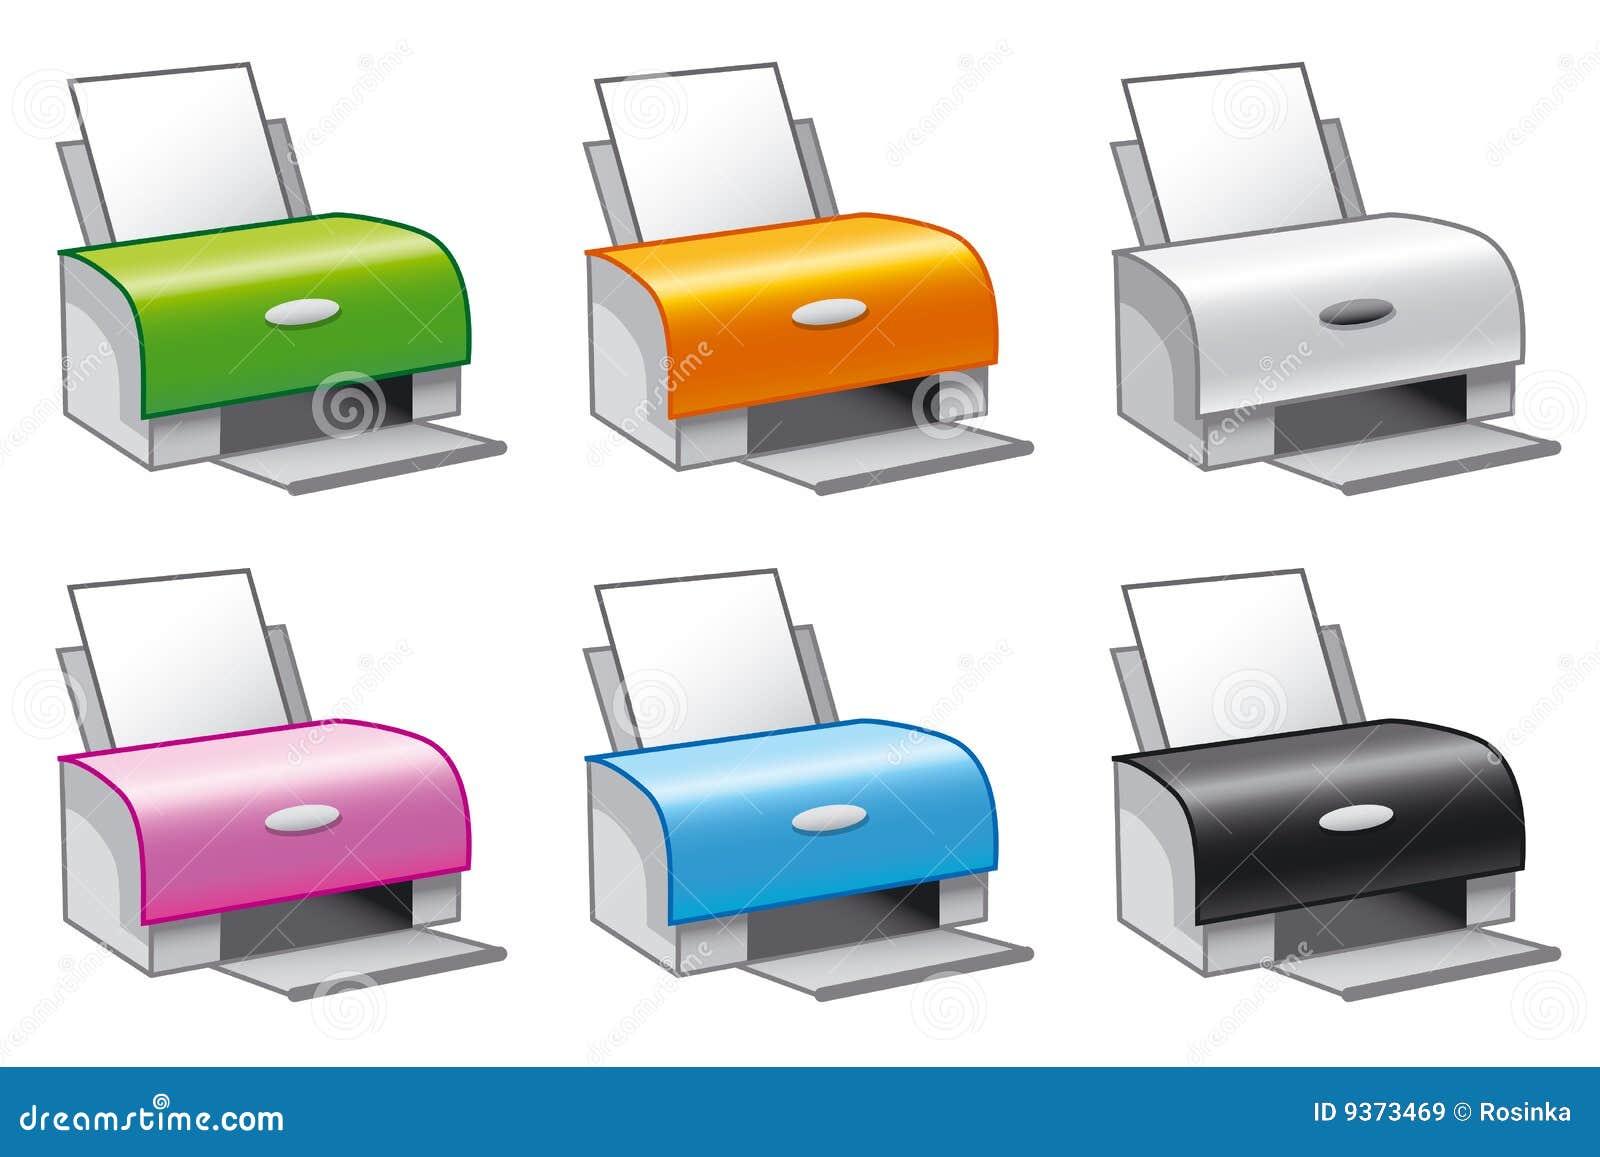 Printers Stock Illustrations – 292 Printers Stock Illustrations ...